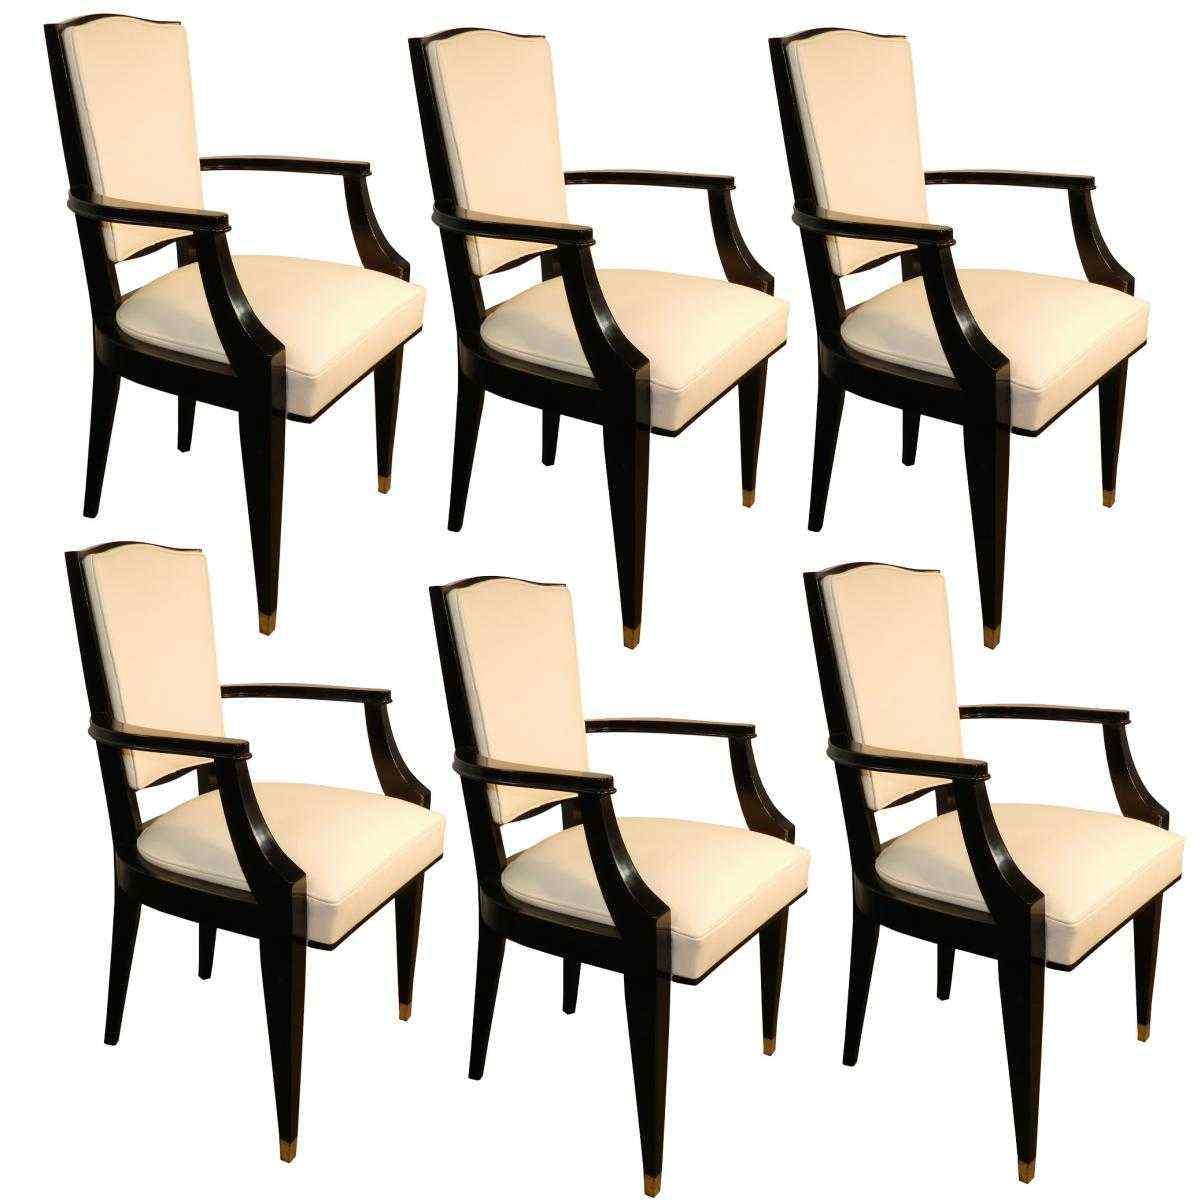 Jean Pascaud, Gruppo di sedie, Art decò